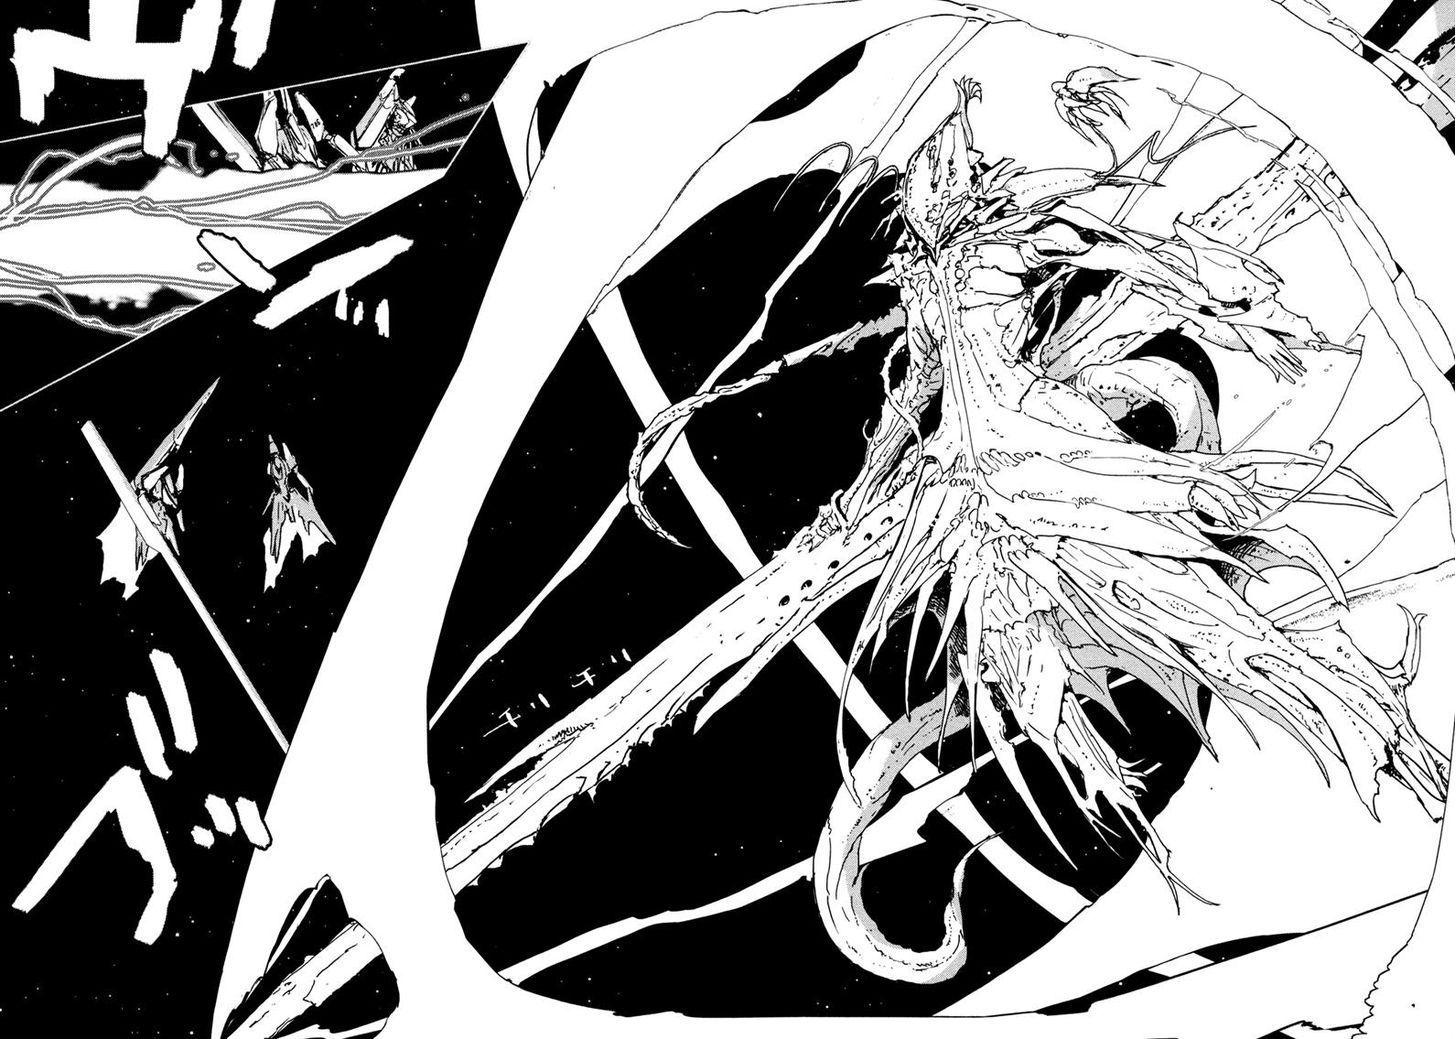 knights of sidonia | ... para Anunciado anime do mangá Knights of Sidonia, de Tsutomu Nihei